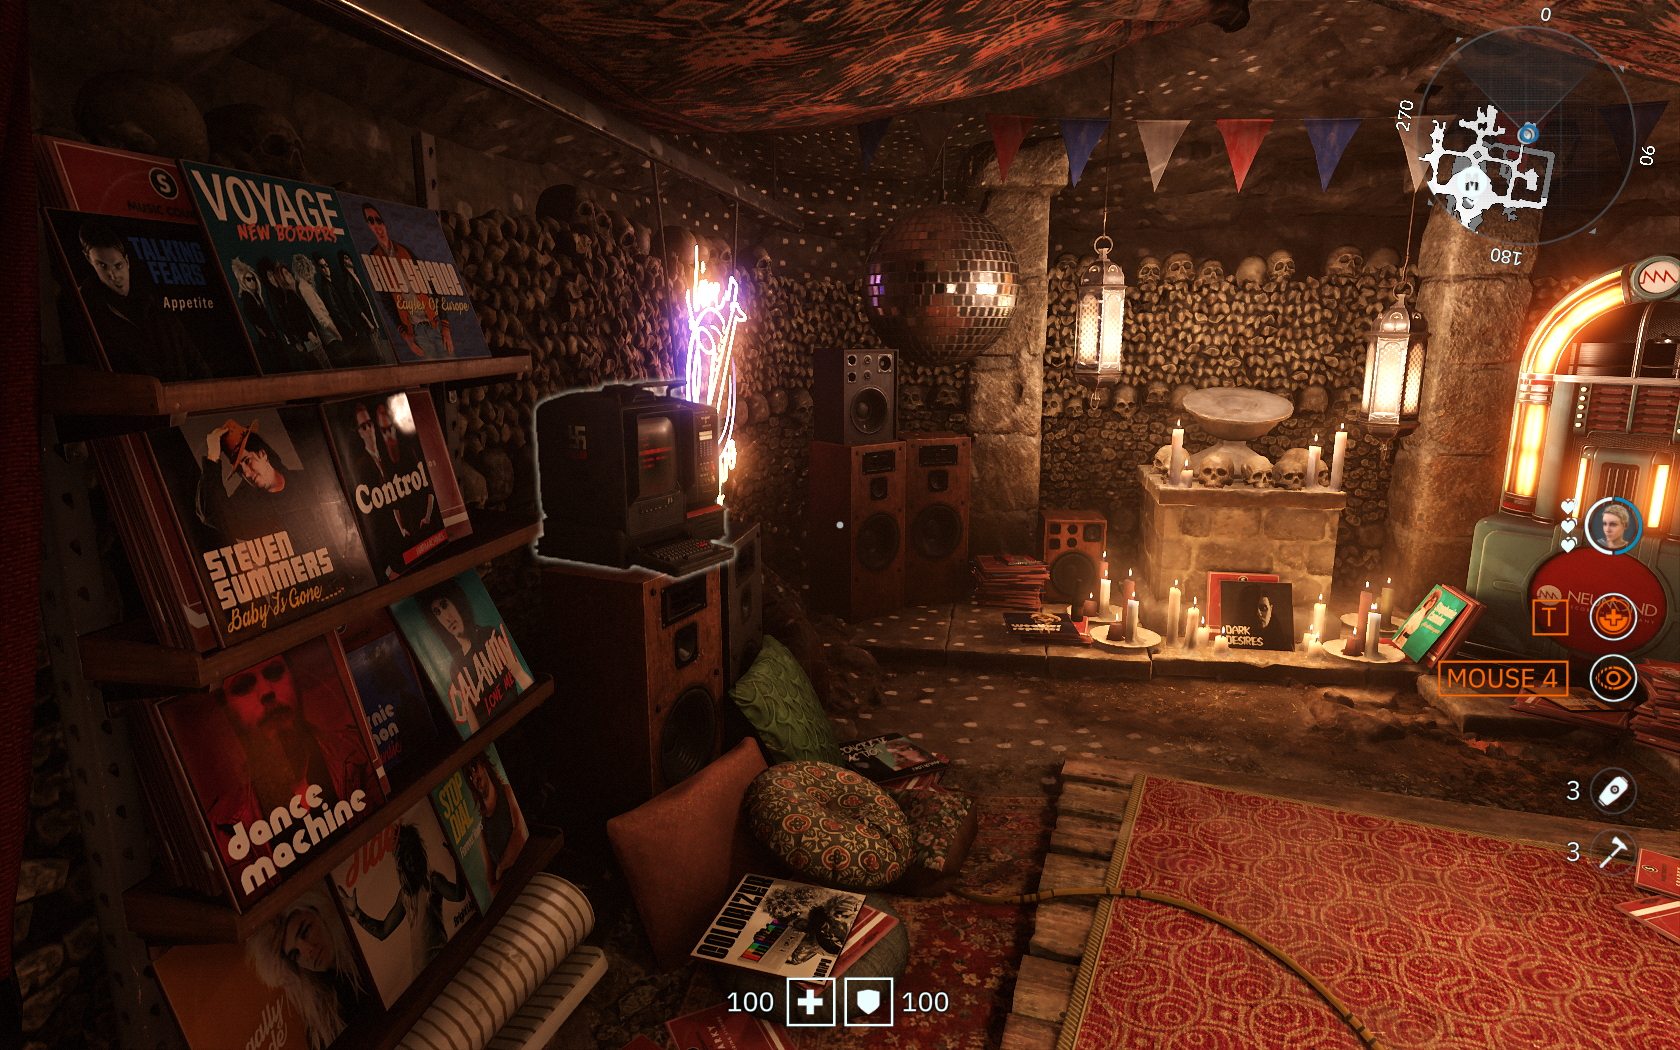 Wolfenstein  Youngblood Screenshot 2019.07.28 - 15.27.48.46.png